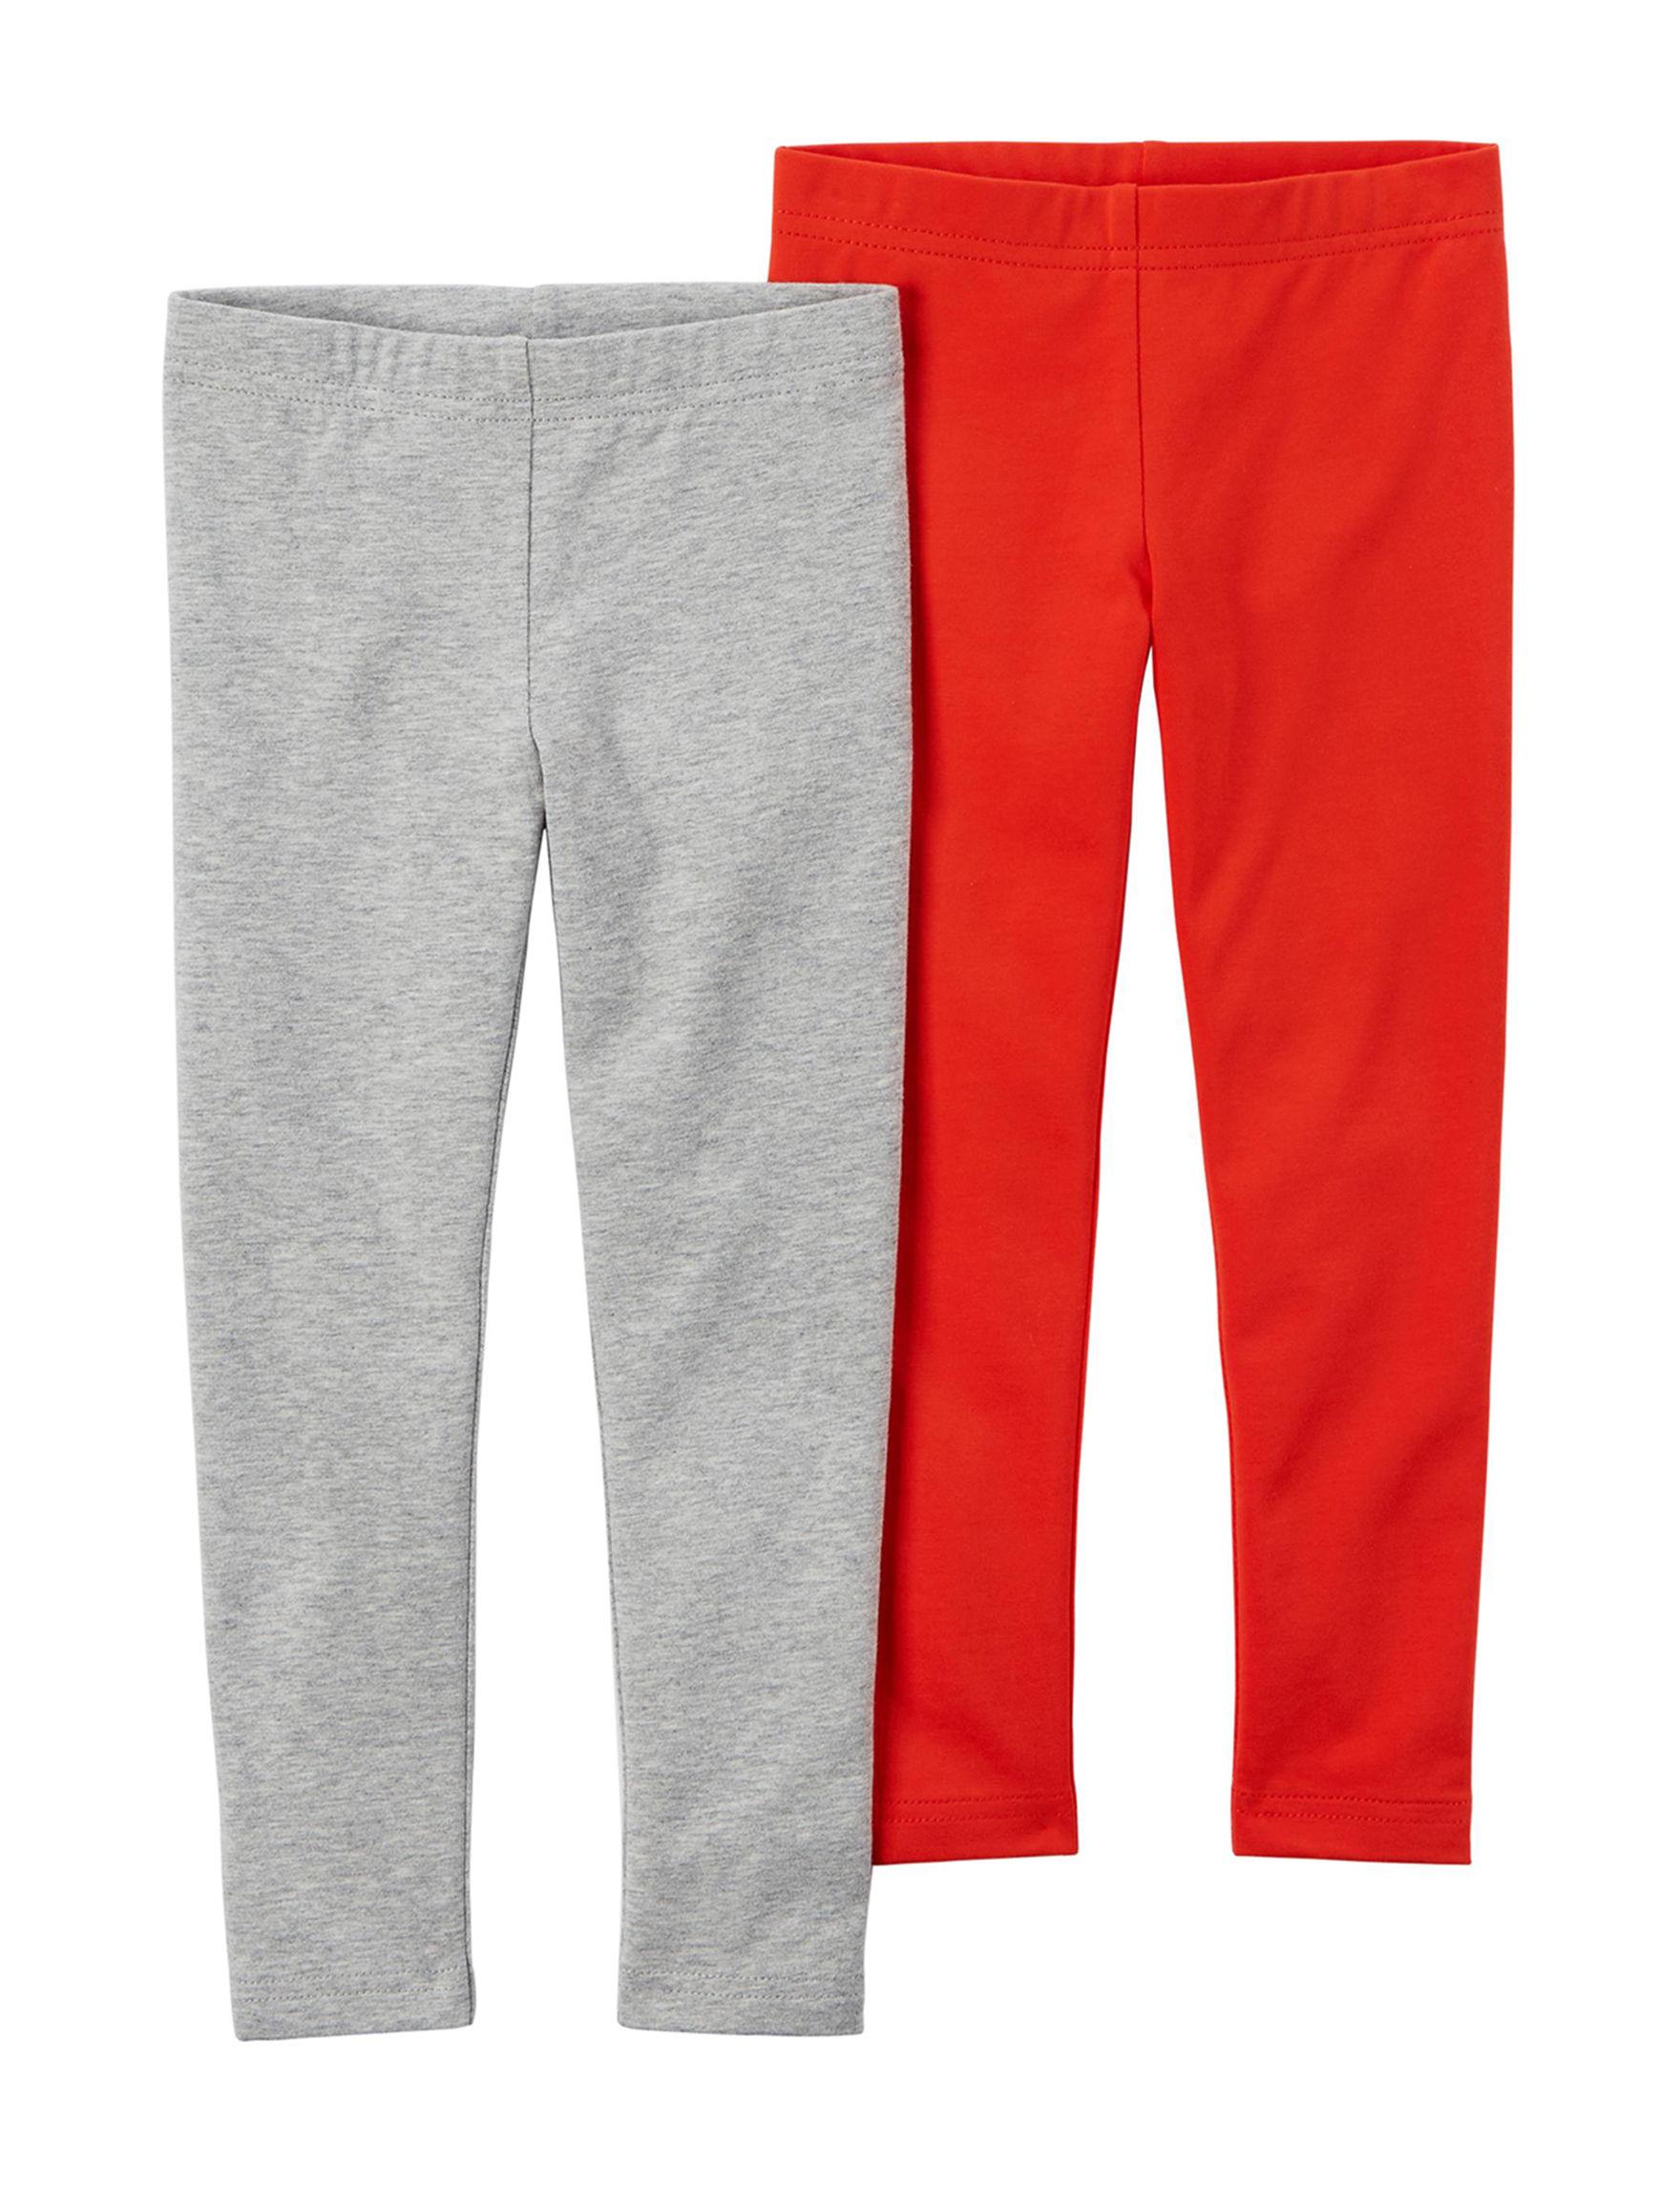 Carter's Red / Grey Leggings